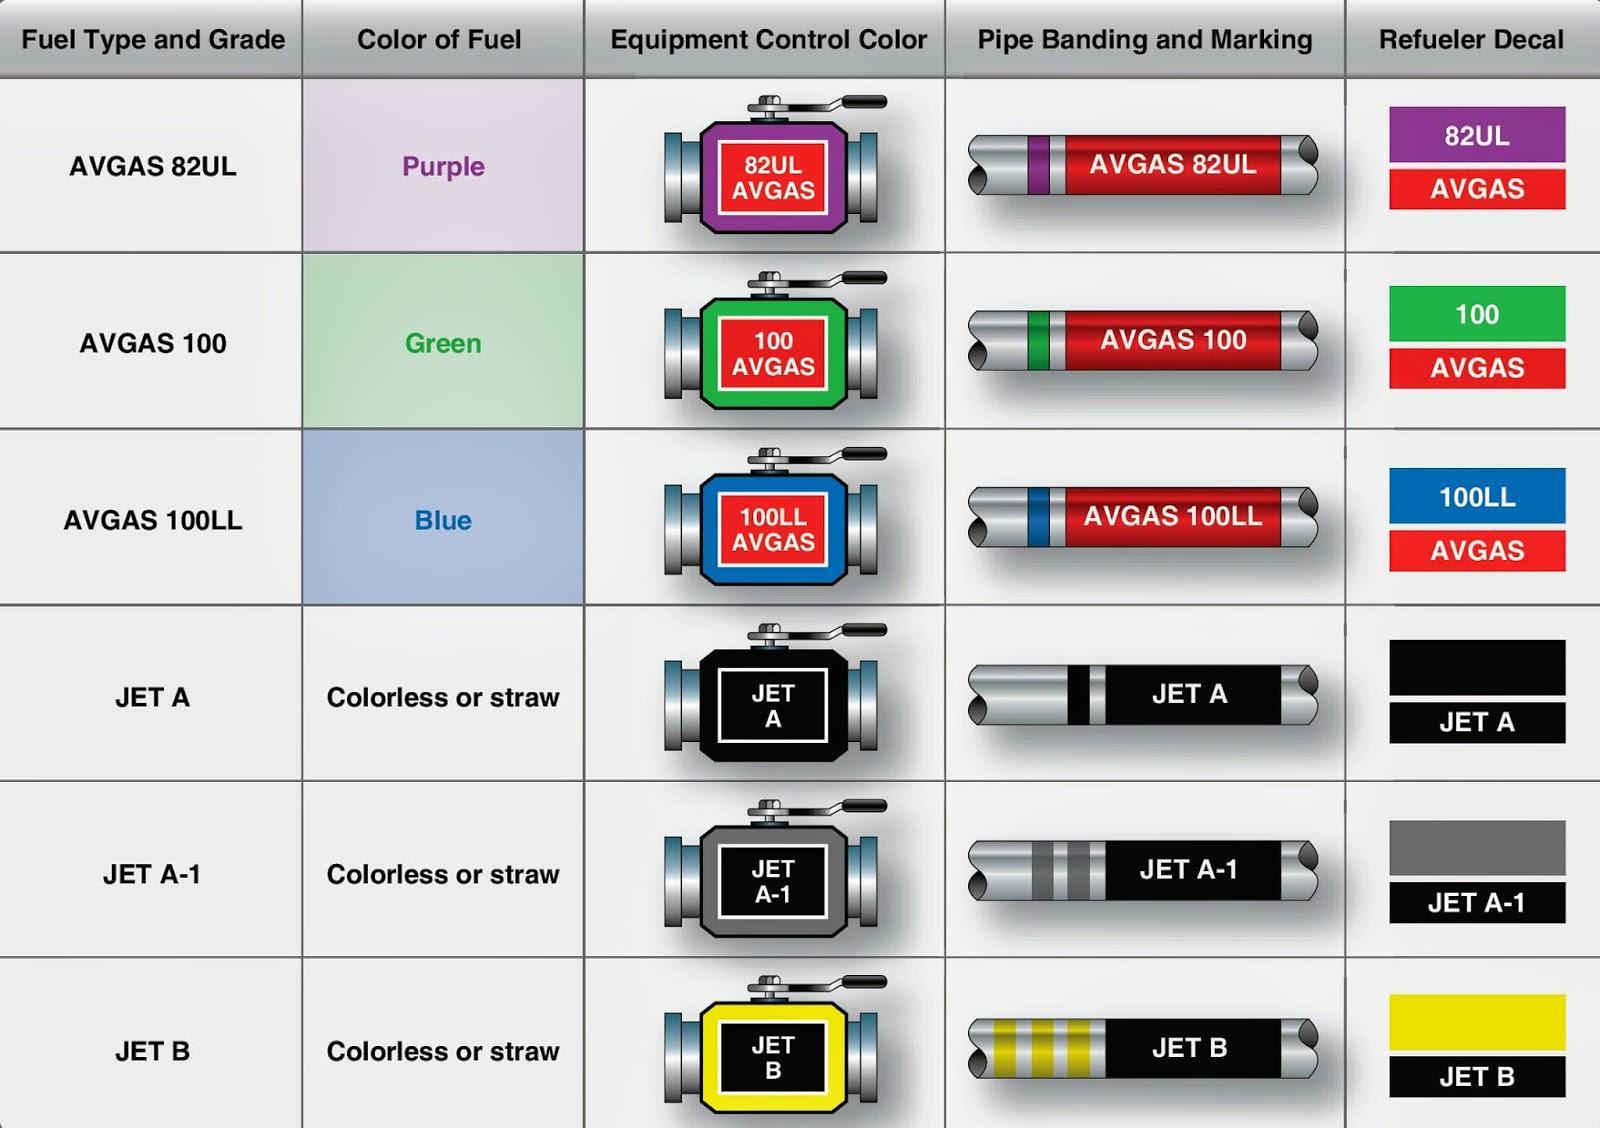 Drawn straw fuel Types Aircraft fuel Fuel color